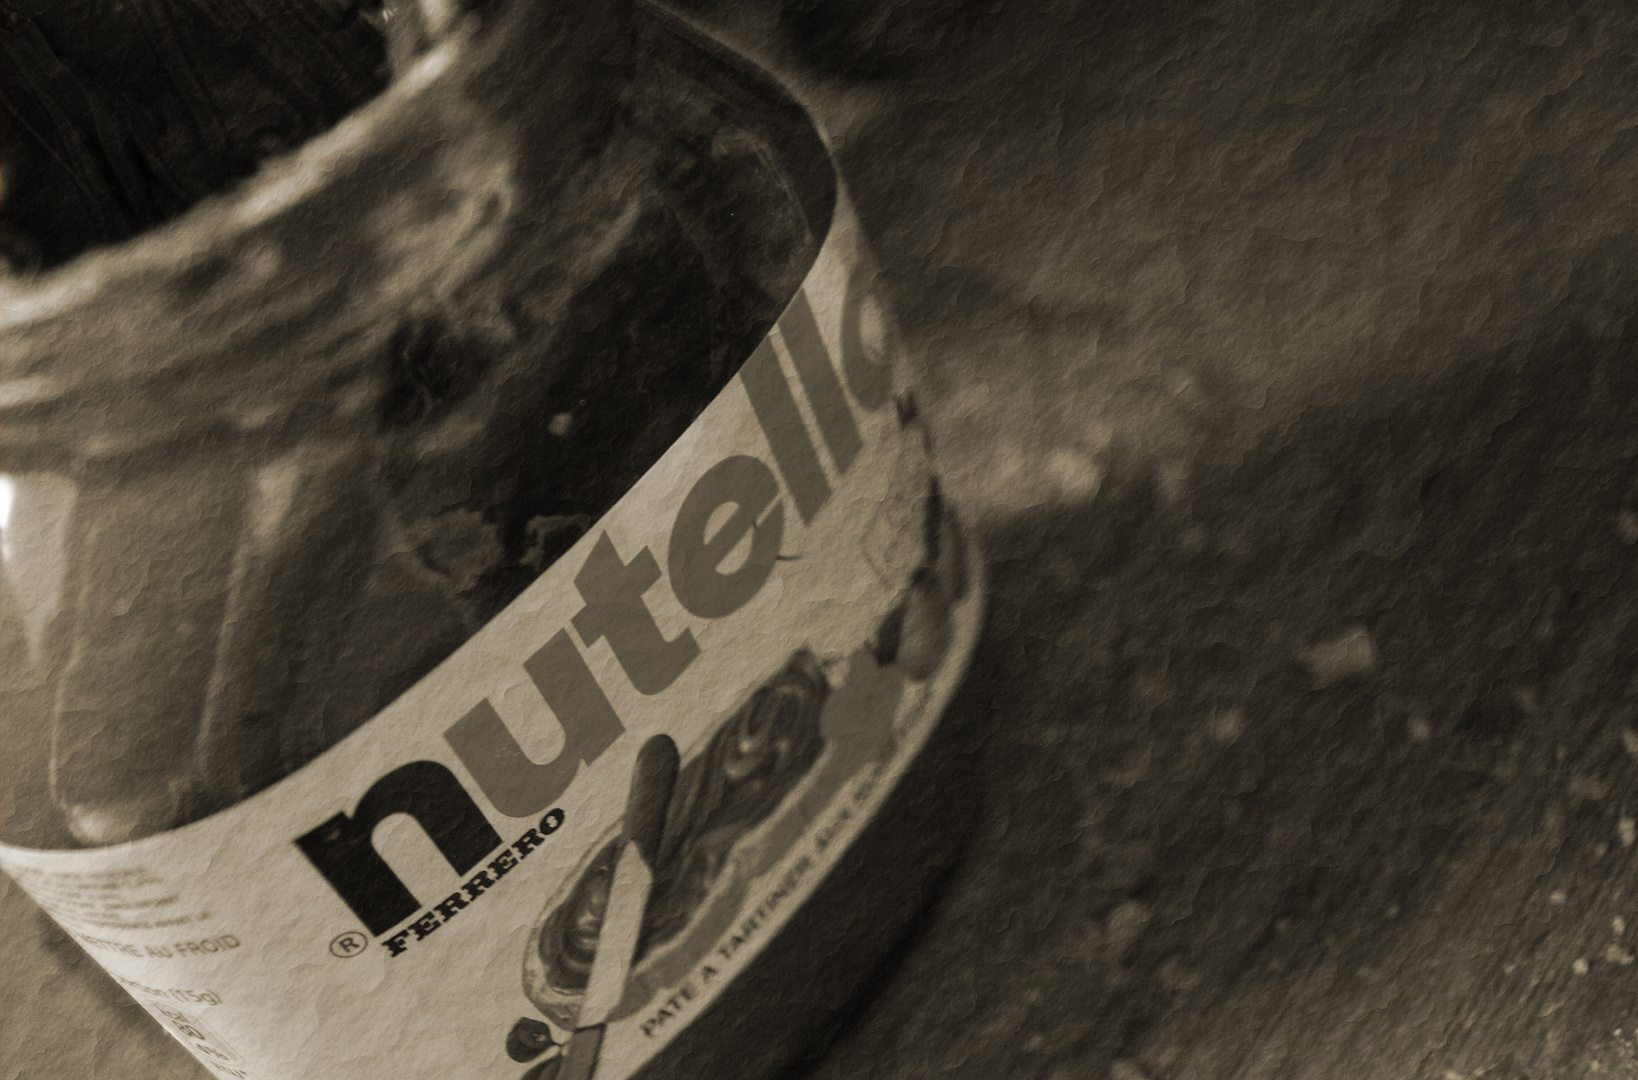 NutellArt